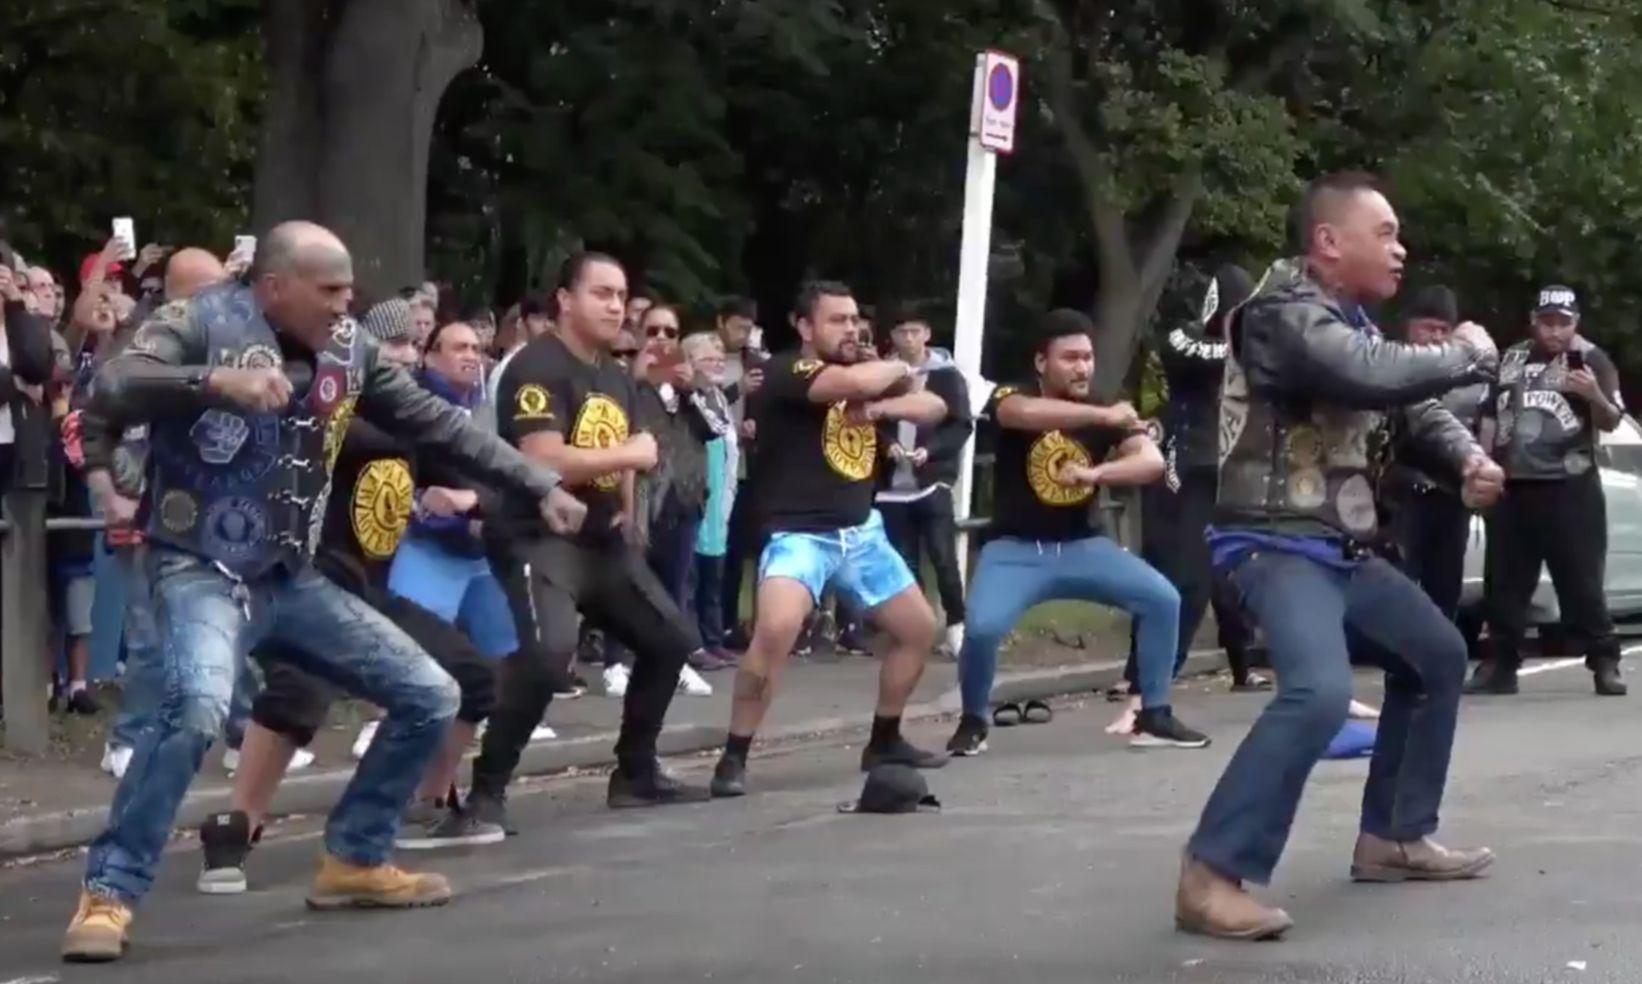 New Zealand Terrorist Attack: What Is The Haka? New Zealand Terror Attack Victims